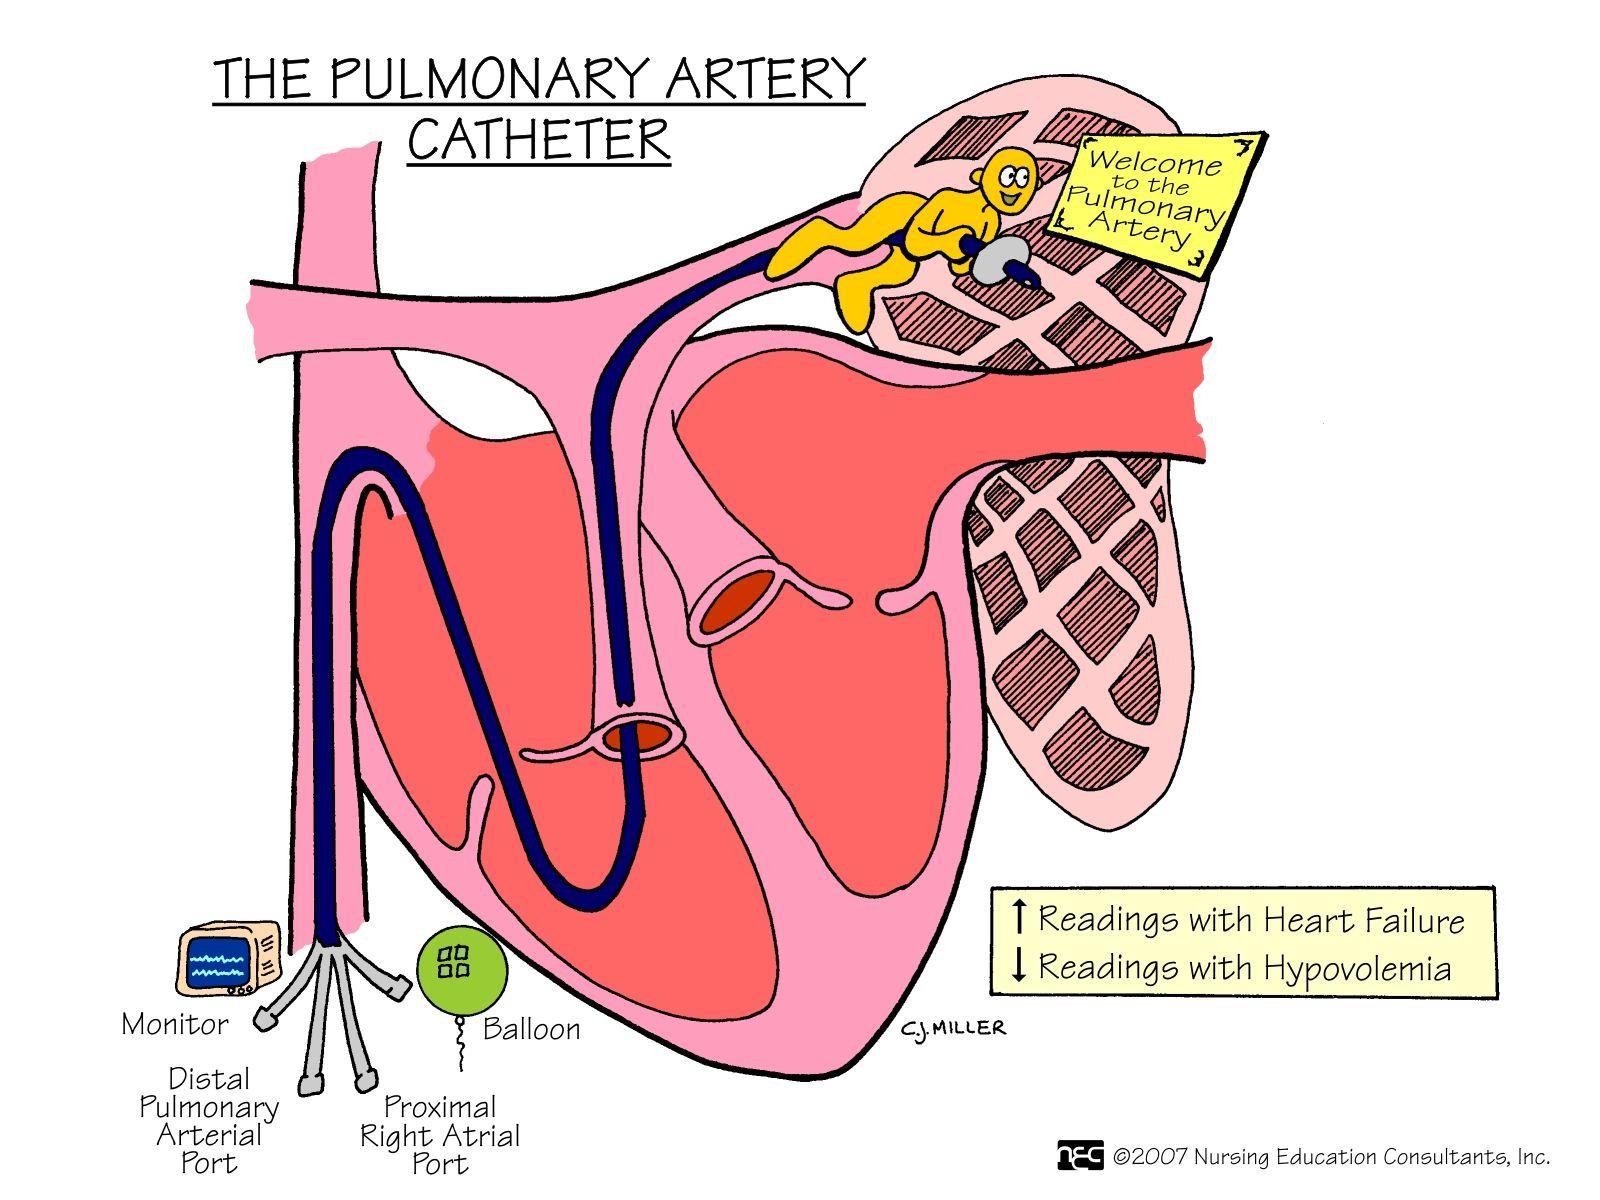 Pulmonary Artery Catheter A pulmonary artery catheter (PAC